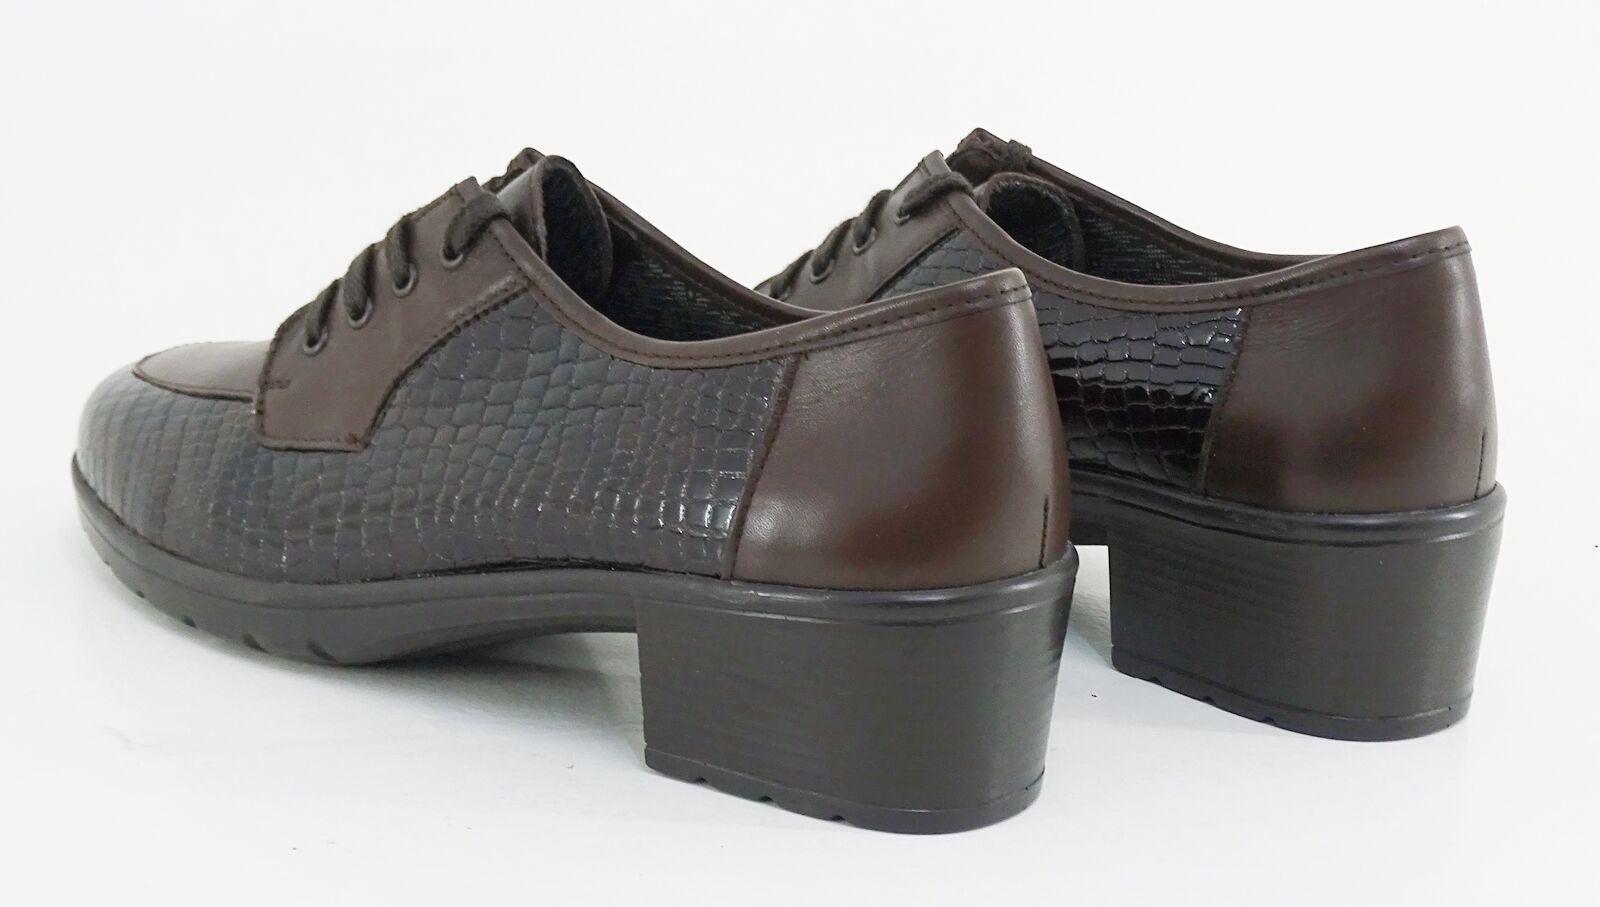 Con cordones meisi Comfort zapato zapato zapato bajo tacón cuero genuino marrón talla 6 = 39 W  g 8a5813